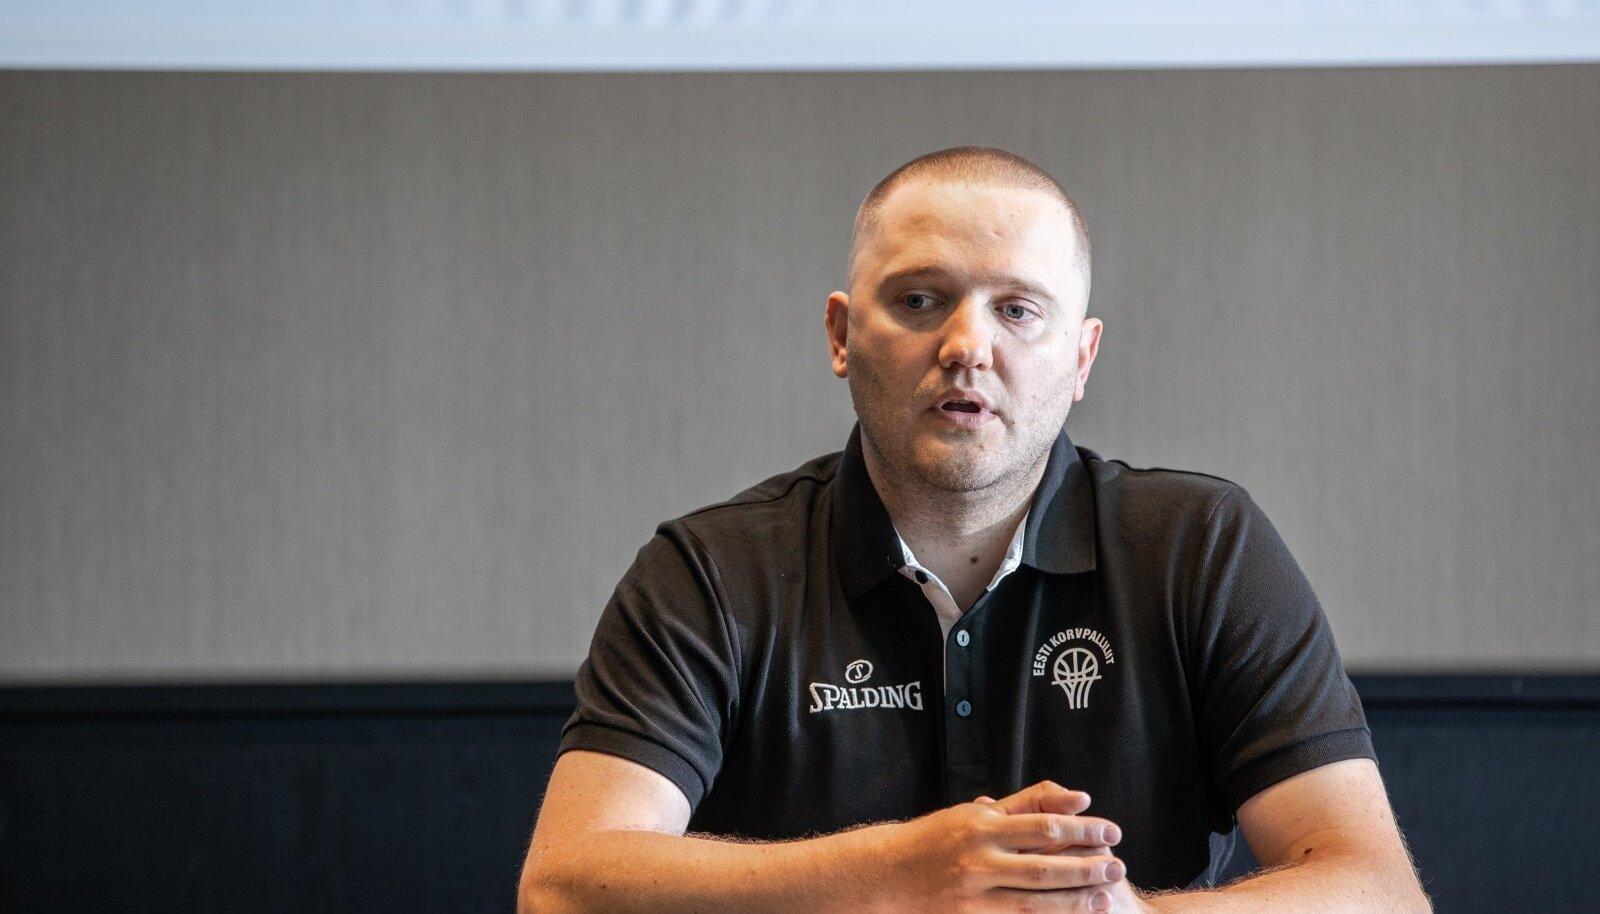 Kaspars Majenieks